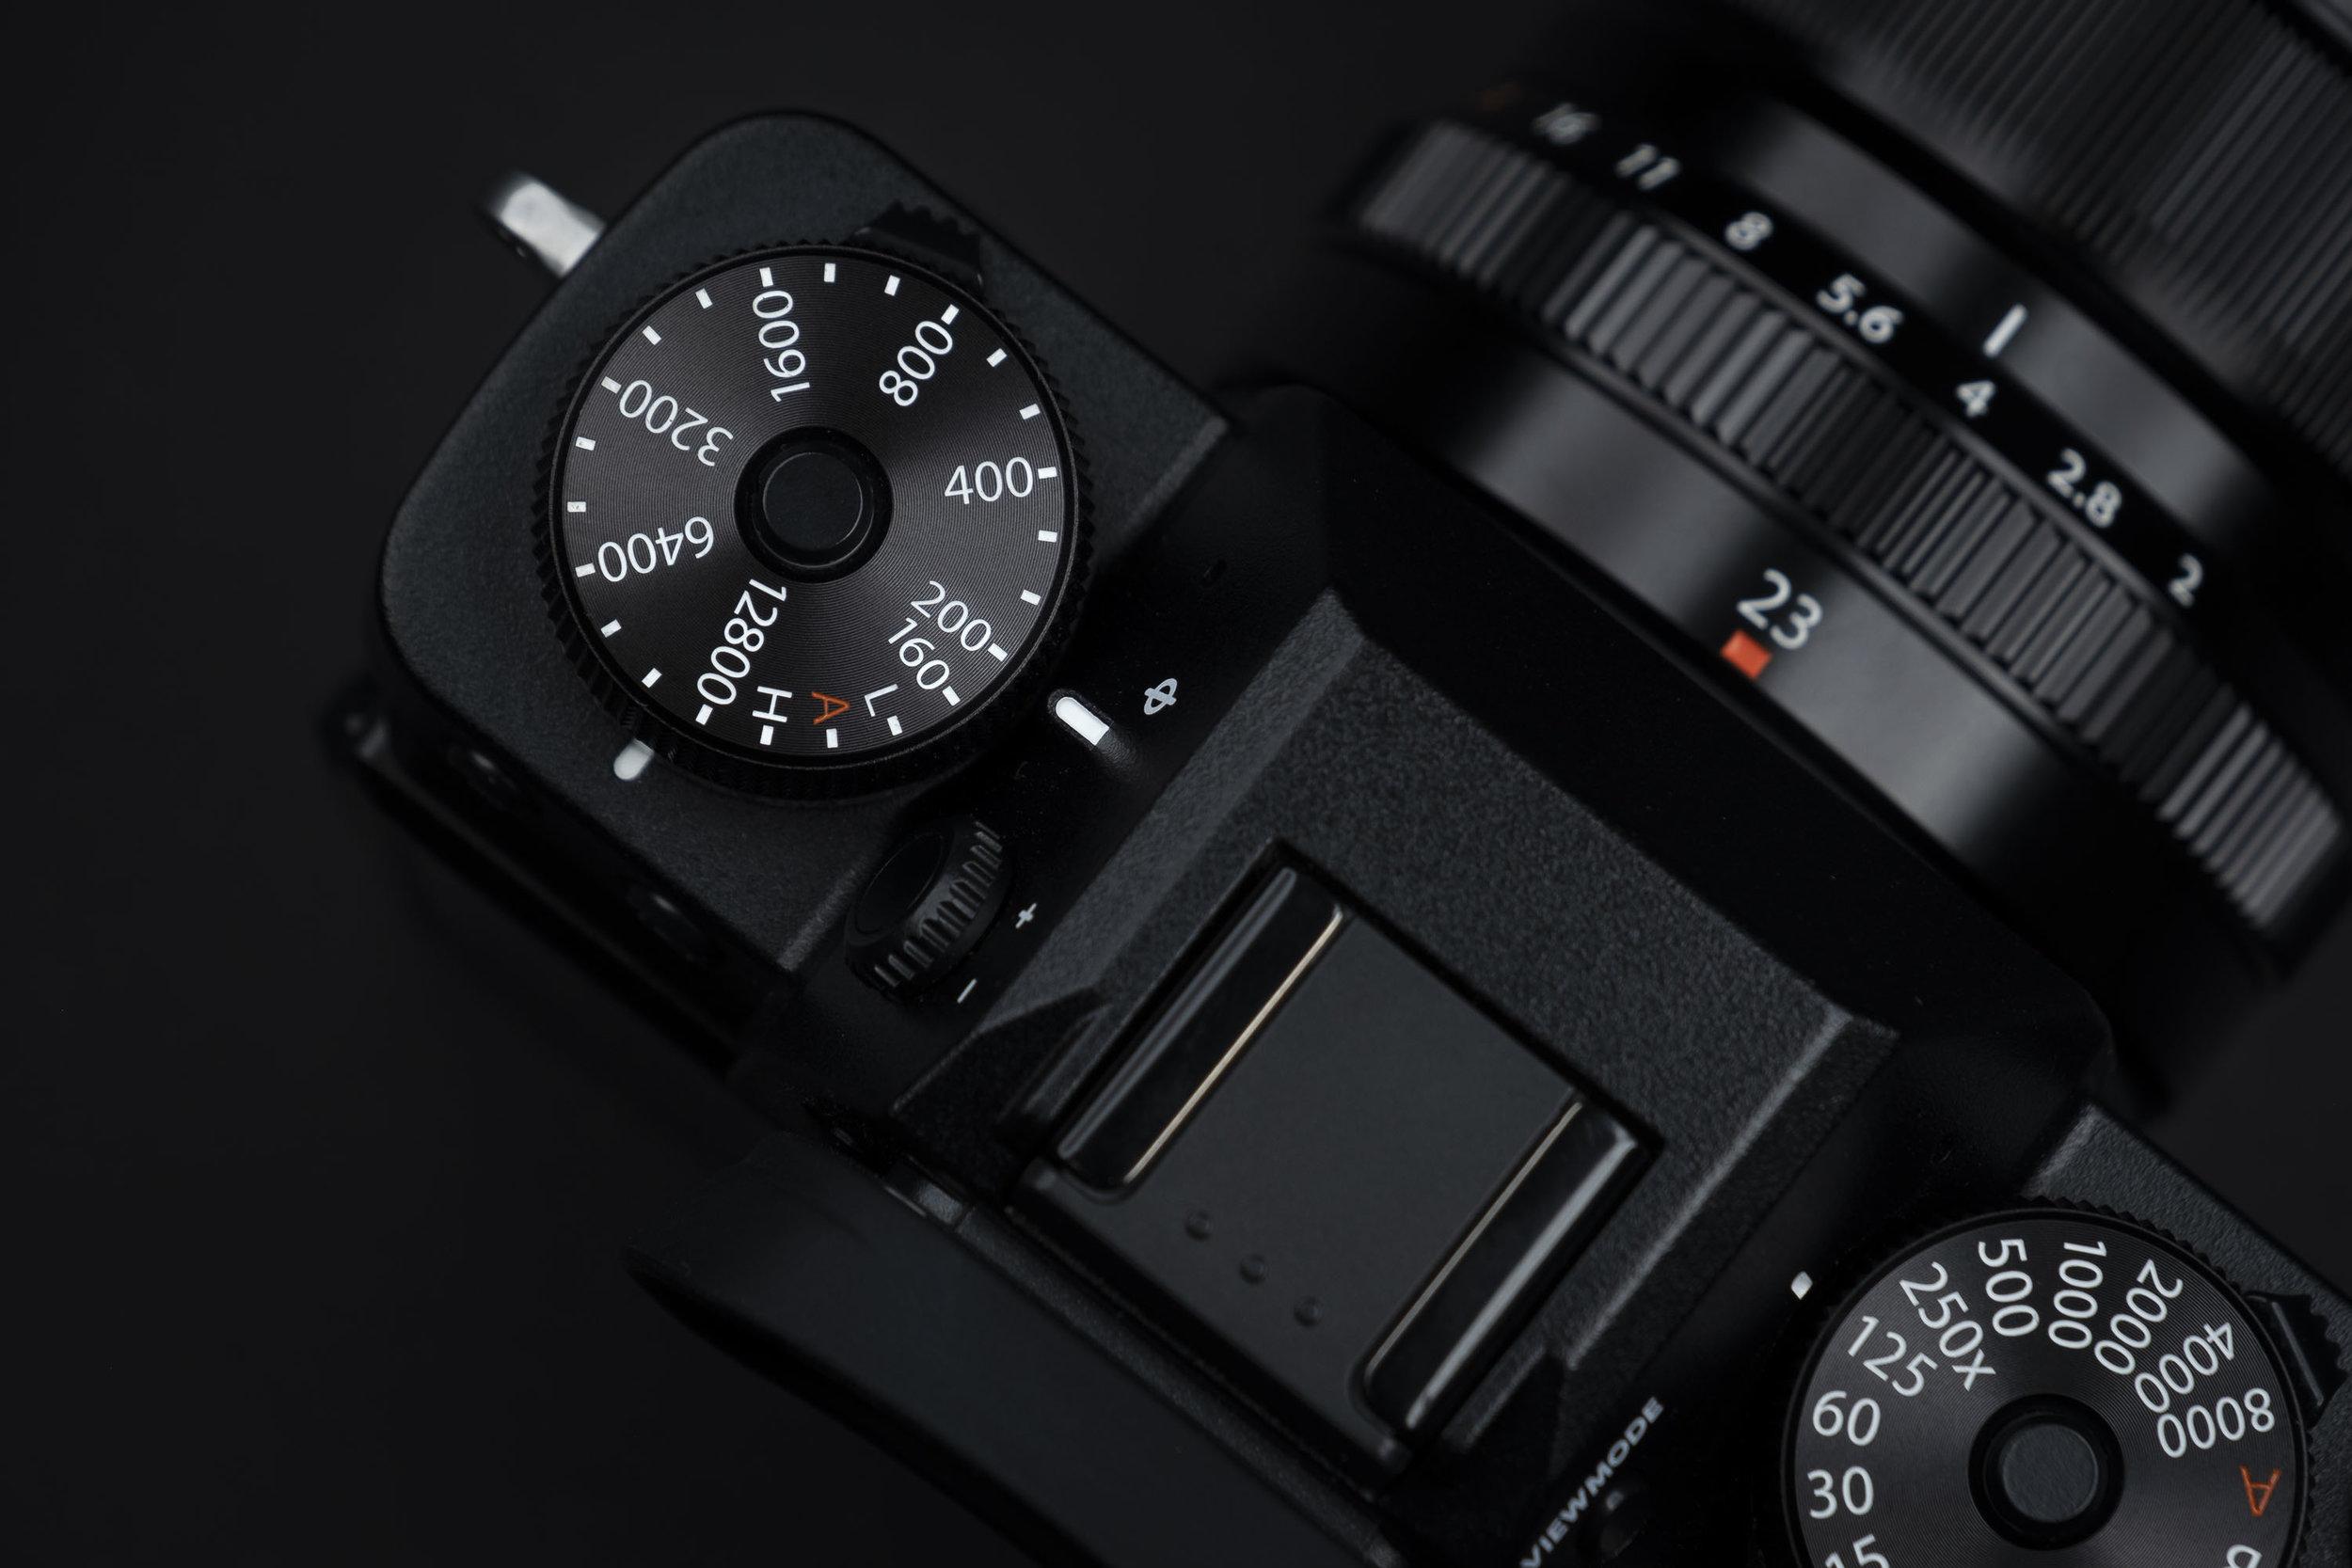 FUJIFILM-X-T3-REVIEW-CAMERA-lr-14.jpg